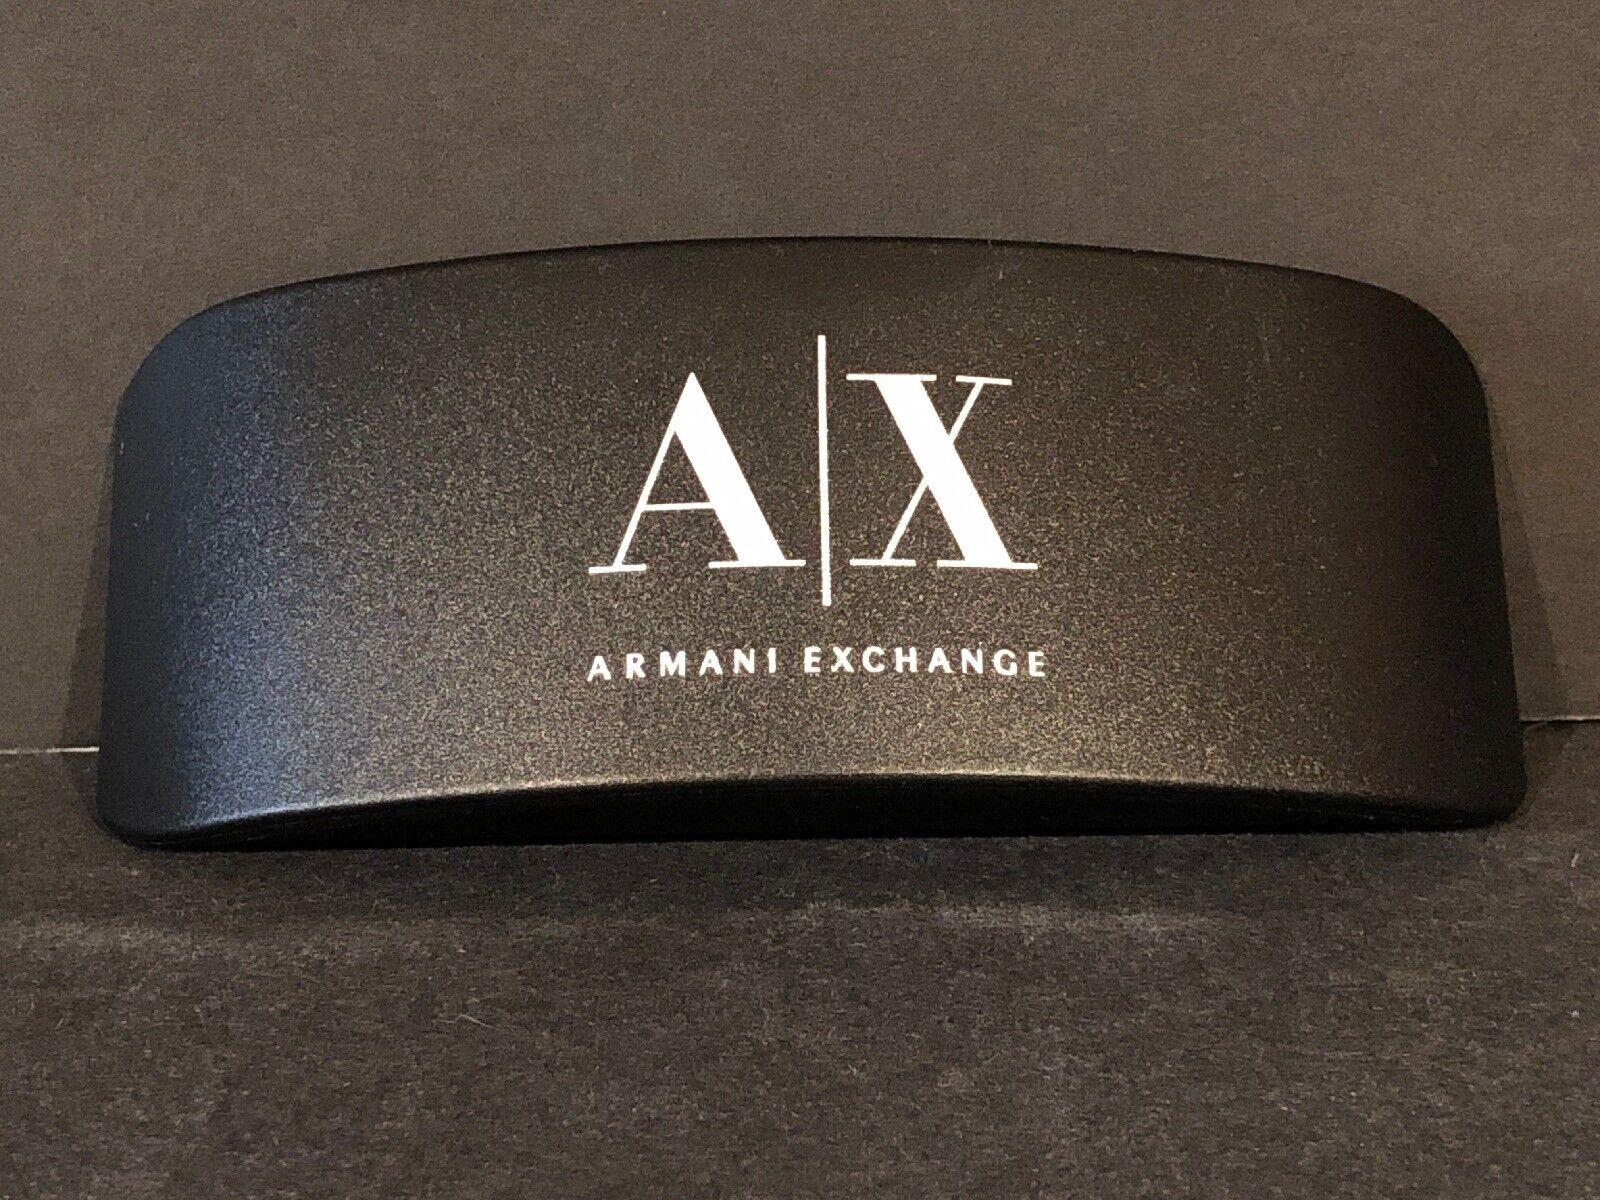 (1) AX ARMANI/EXCHANGE CLAM SHELL HARD EYEGLASS CASE BLACK/SILVER